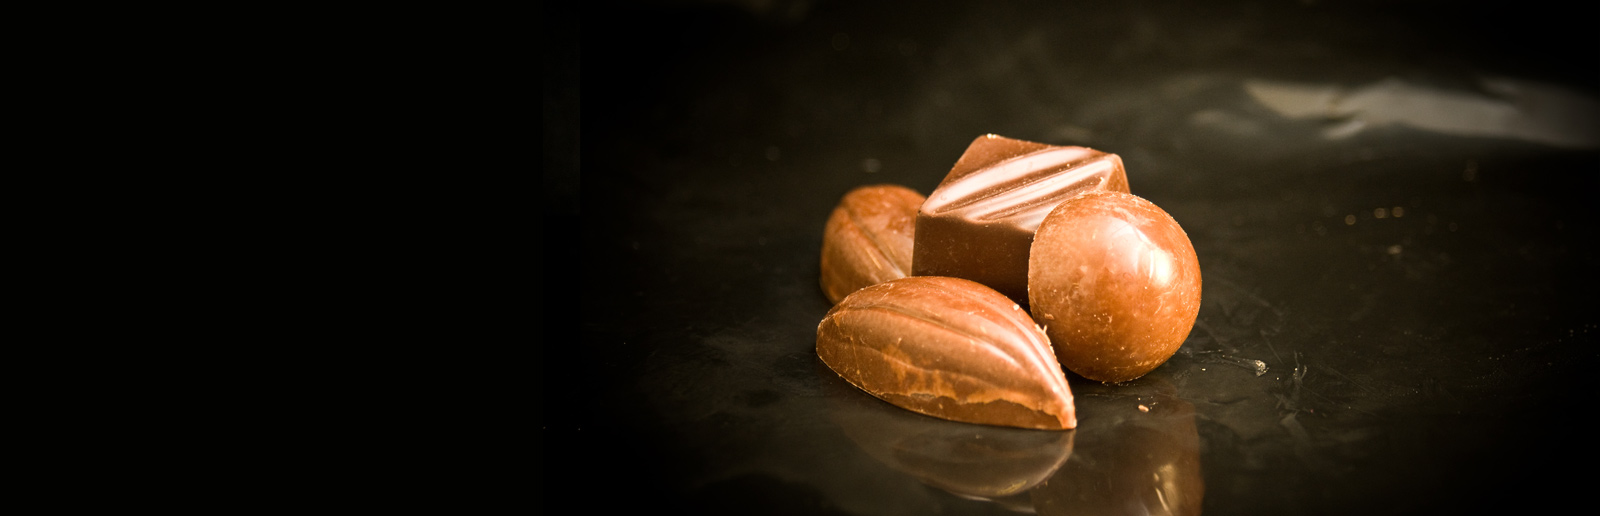 bombones-panaderia-christian